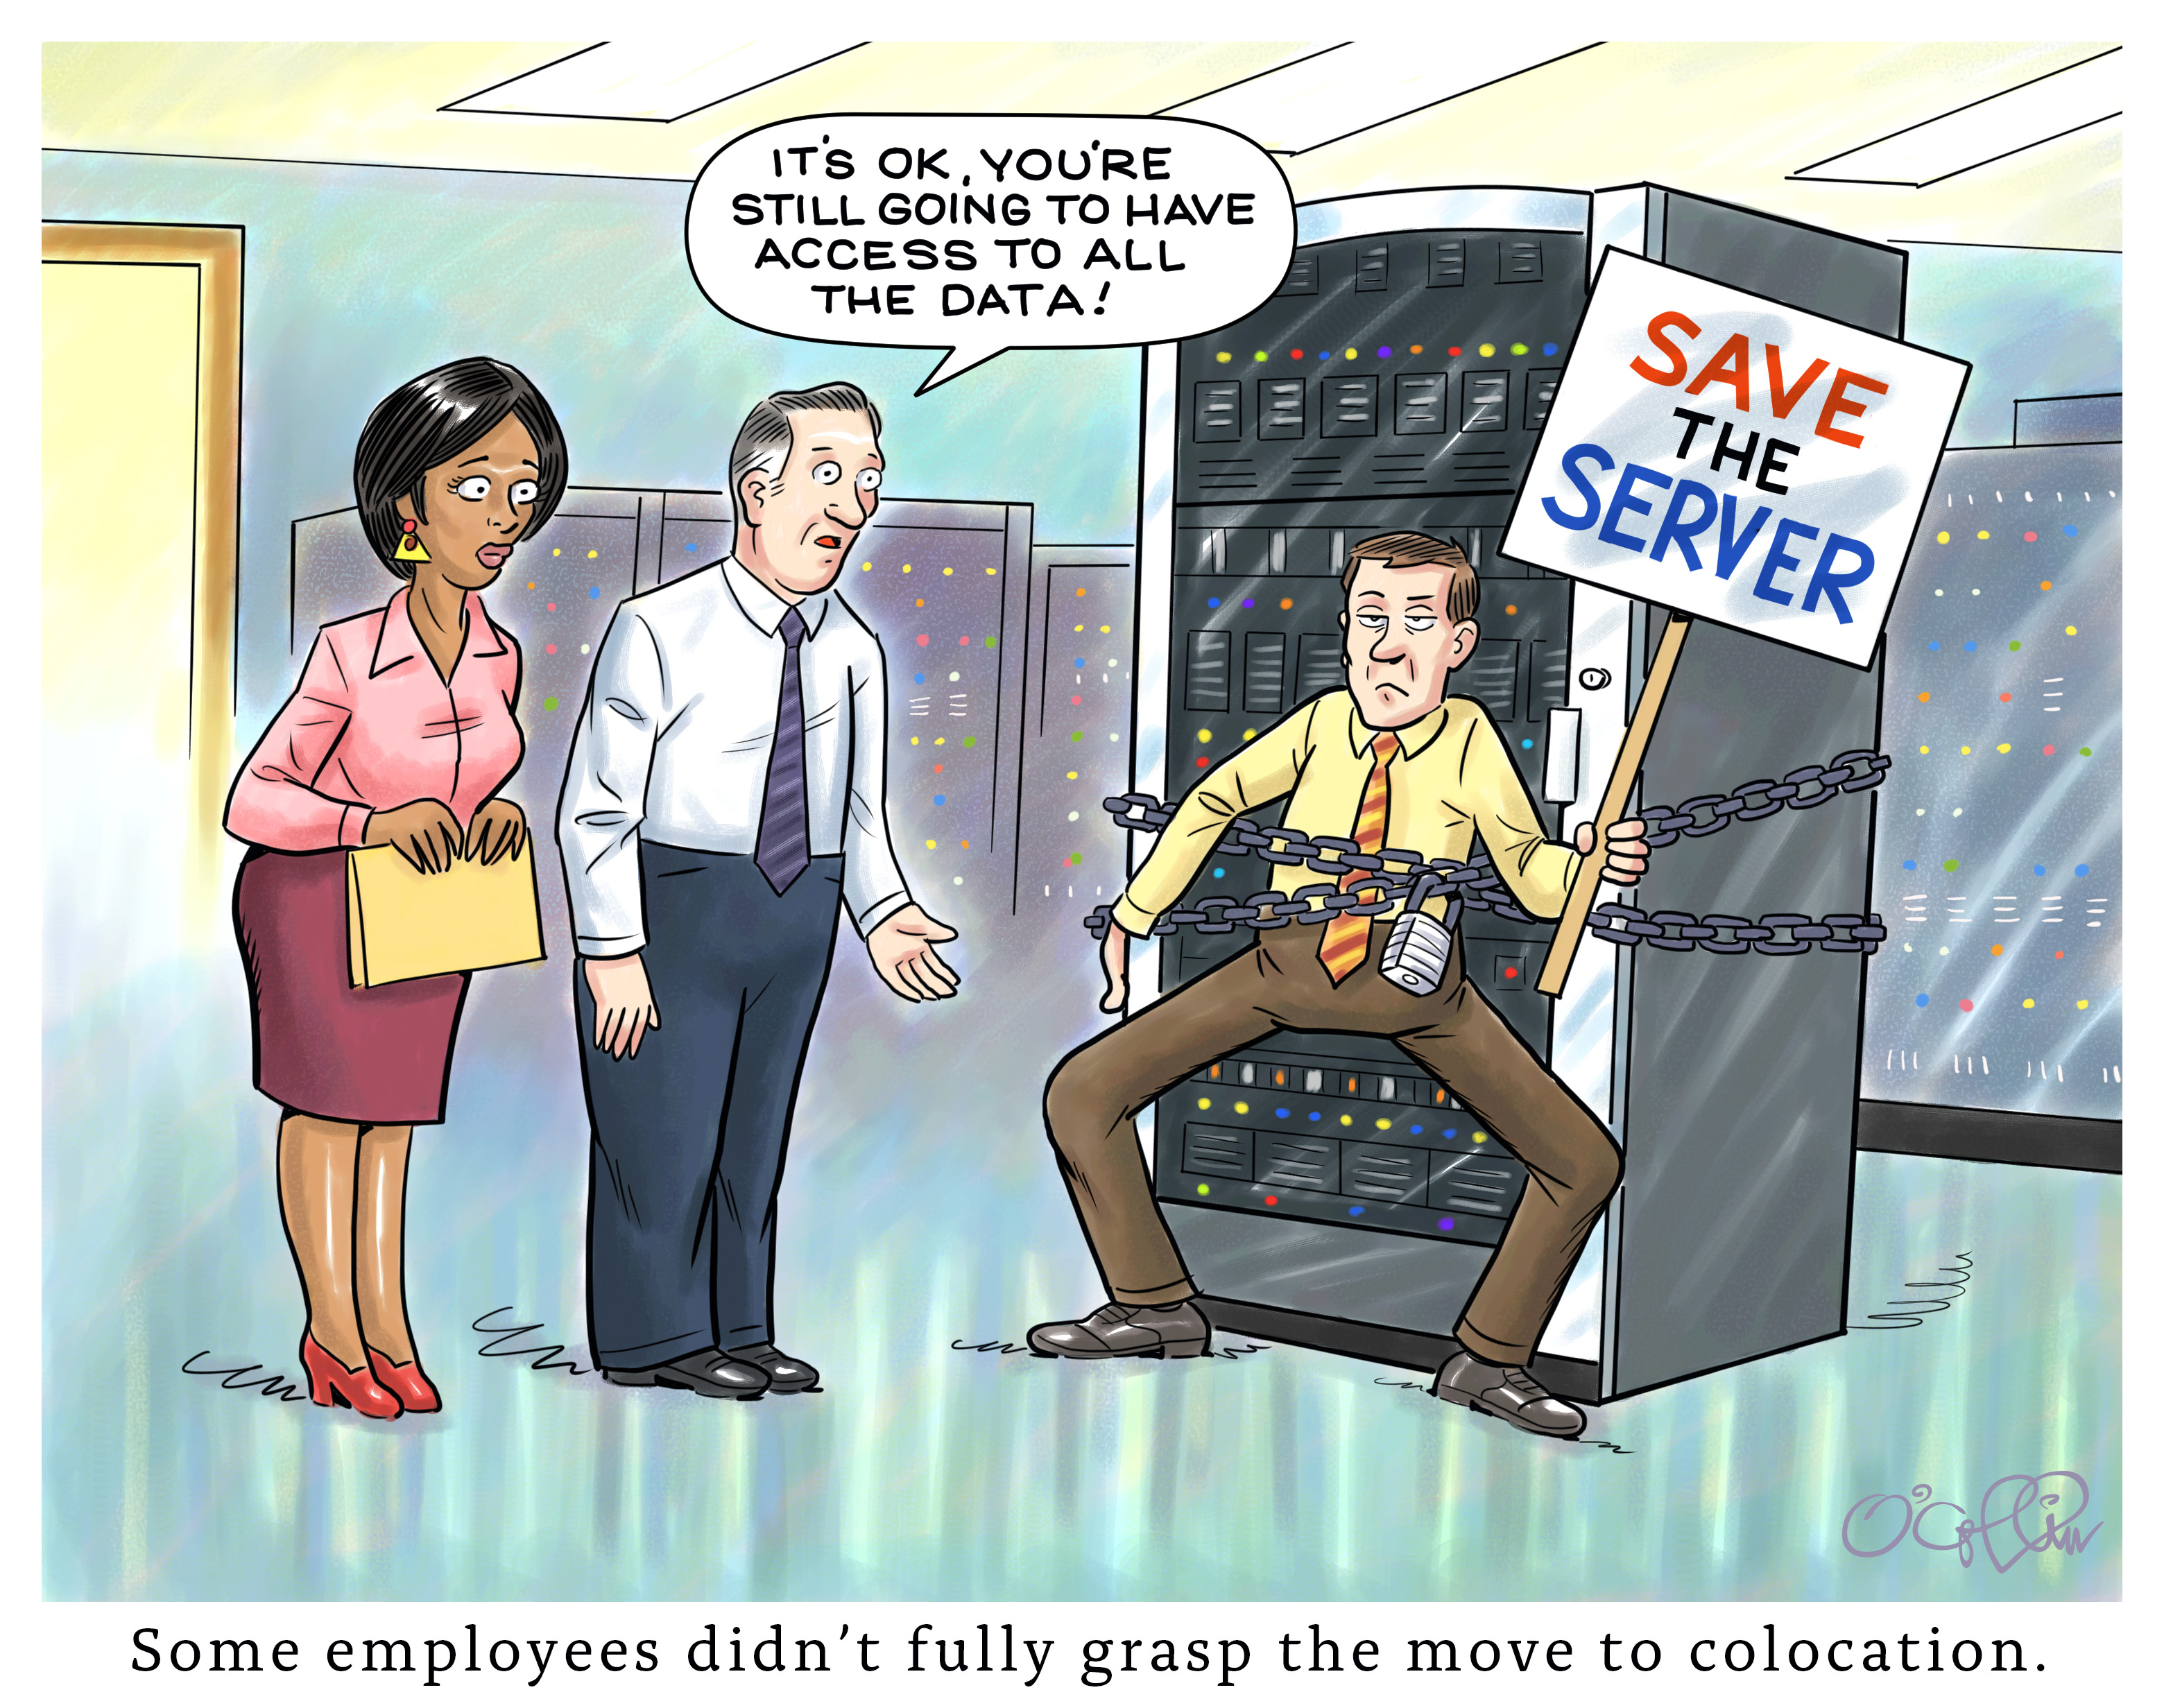 hero-blog-colocation-cartoon-1920x350